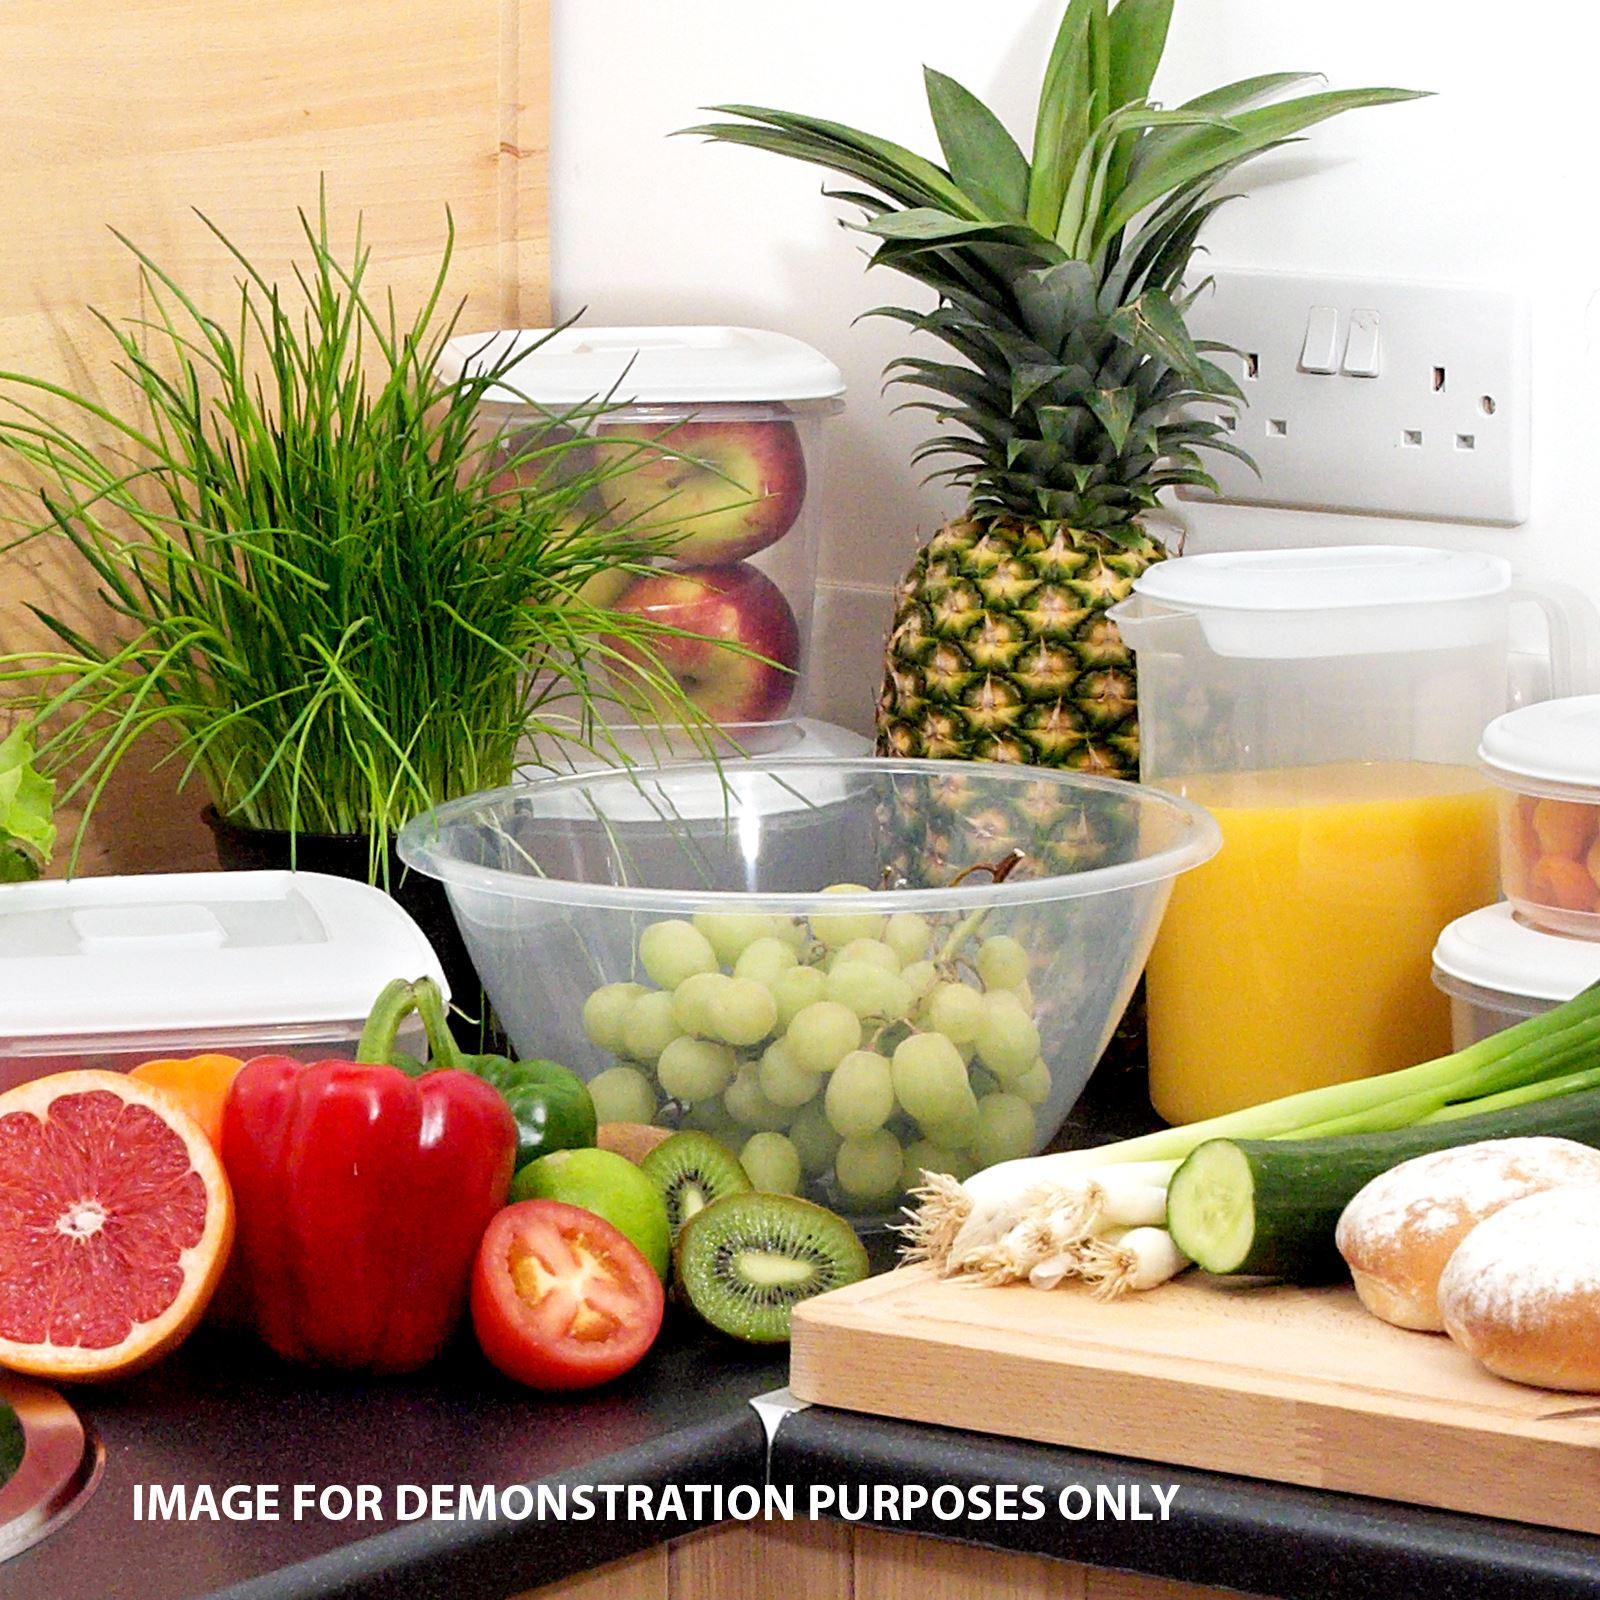 Clear-Plastic-Mixing-Bowl-Measuring-Baking-Salad-Serving-Cooking-Kitchen-Bowls thumbnail 5